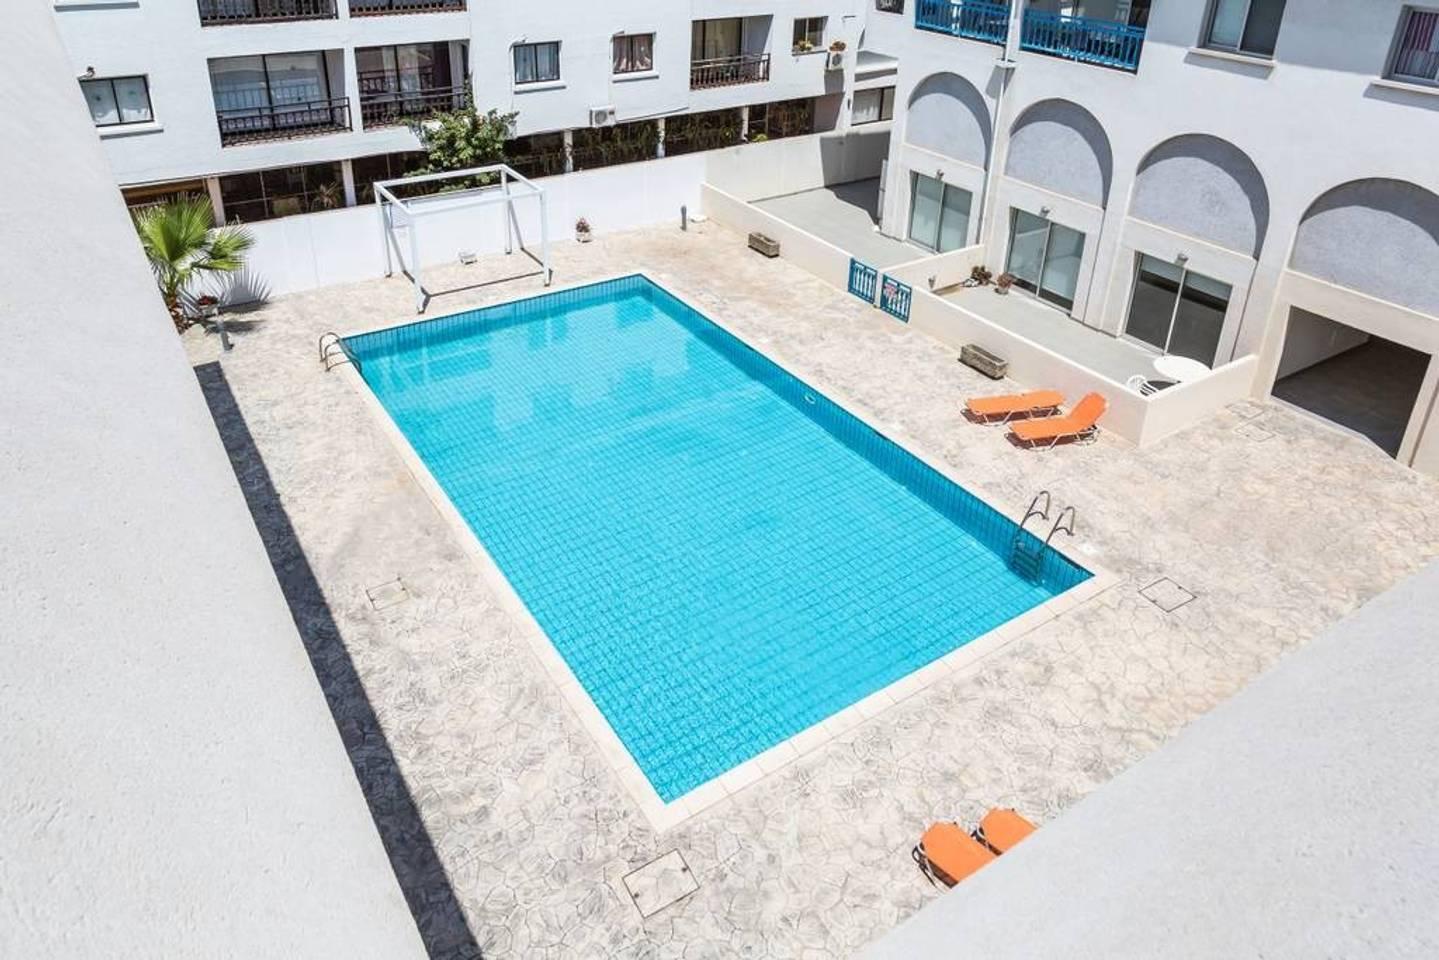 Apartment Large Studio Apt   Ayia Napa Centre   WiFi   Pool   Parking  116  photo 23860703